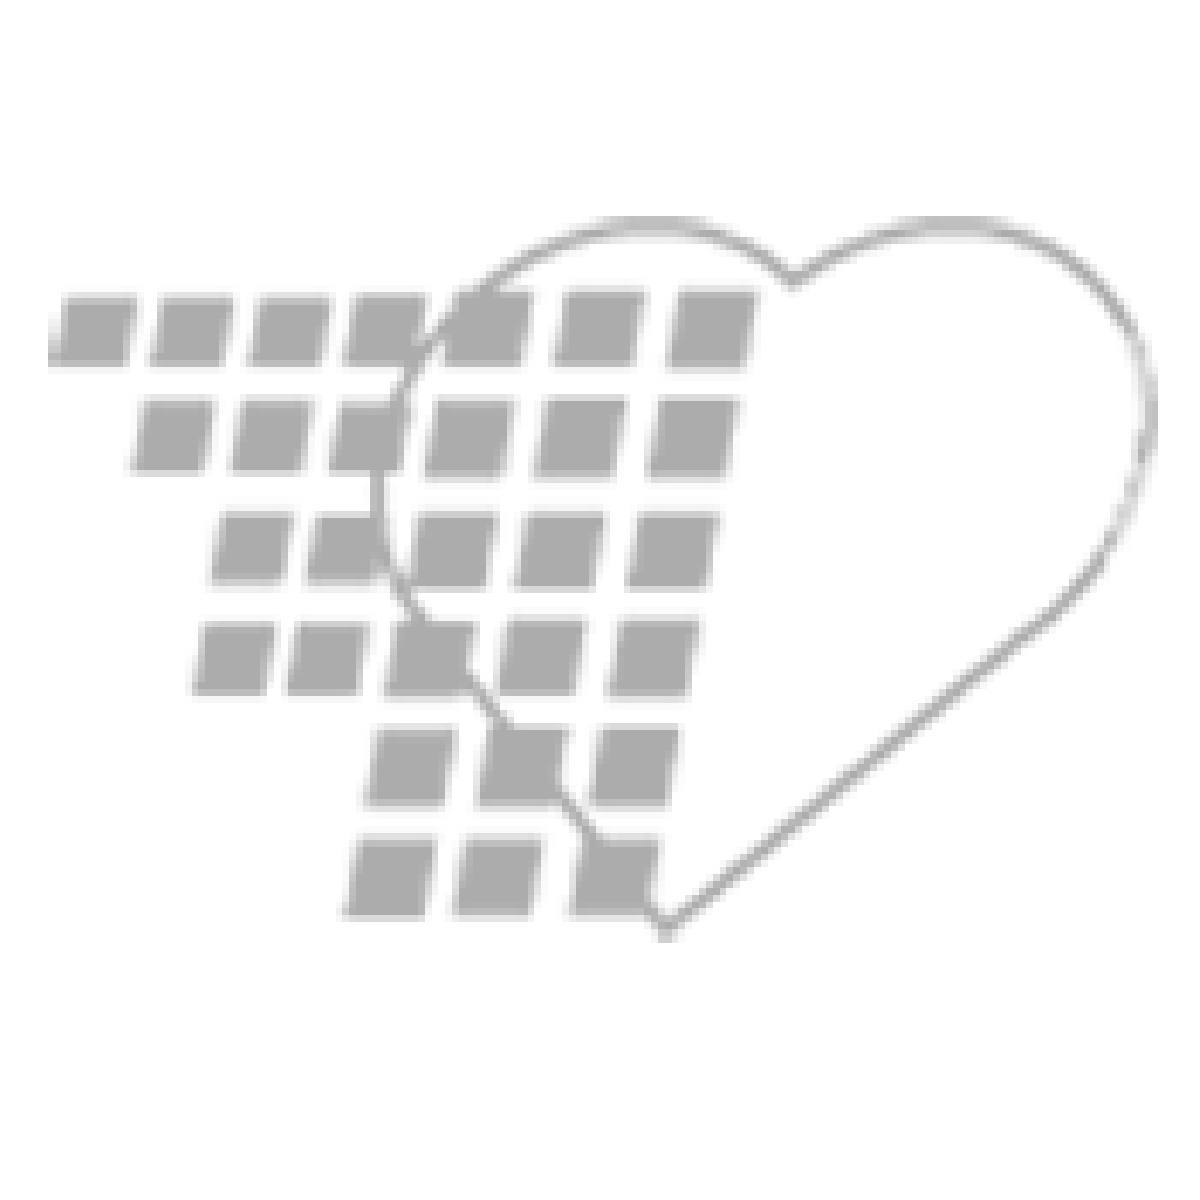 11-81-0505 Laerdal Nursing Anne (SimPad Capable)